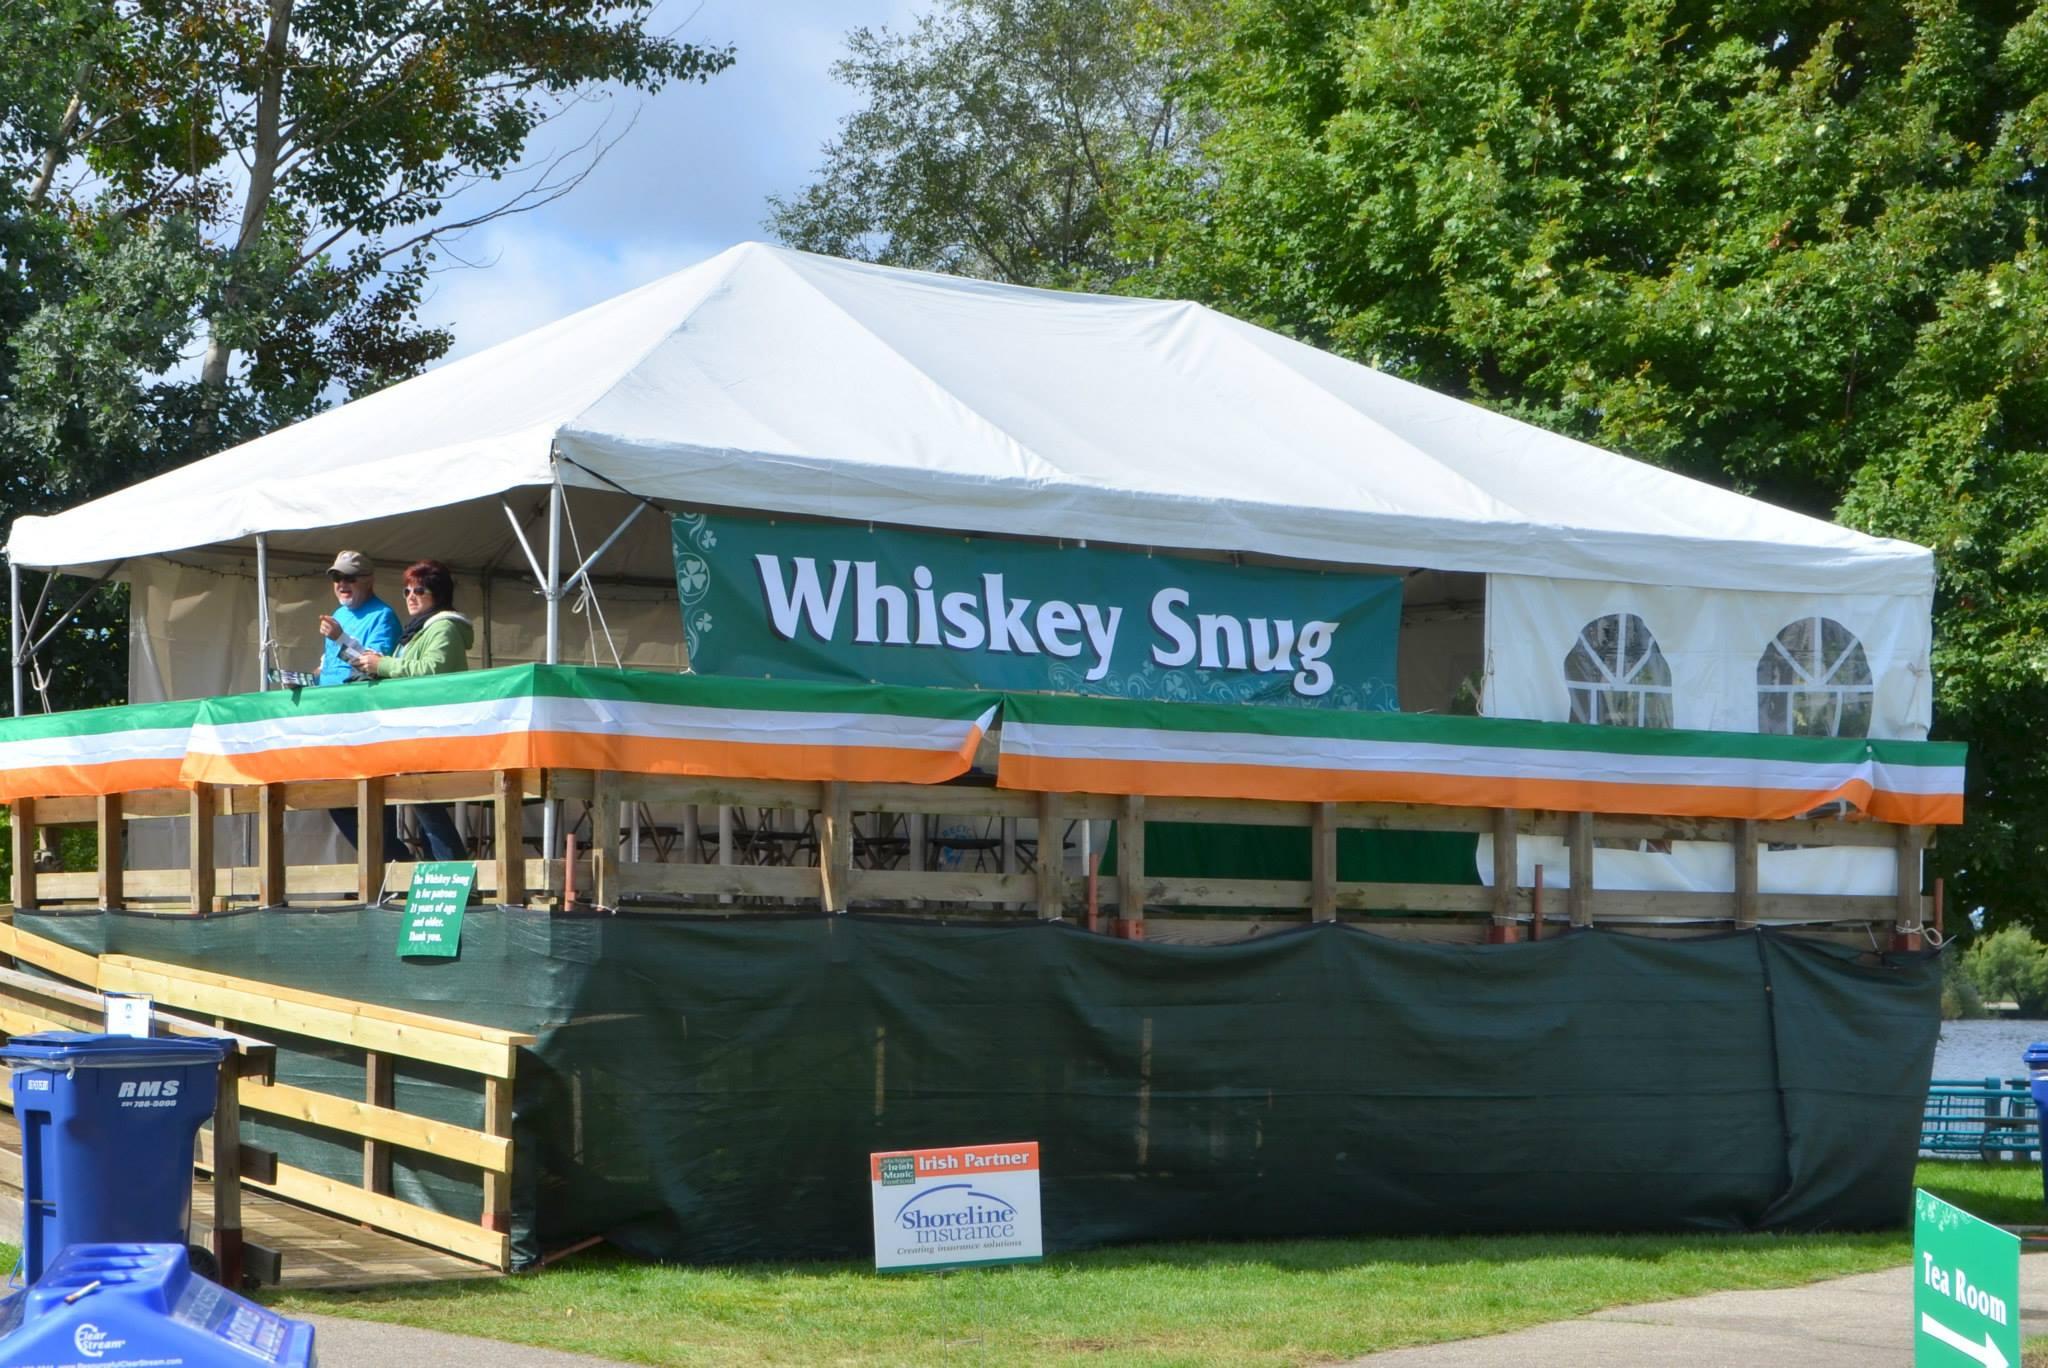 Whiskey Snug - Michigan Irish Music Festival